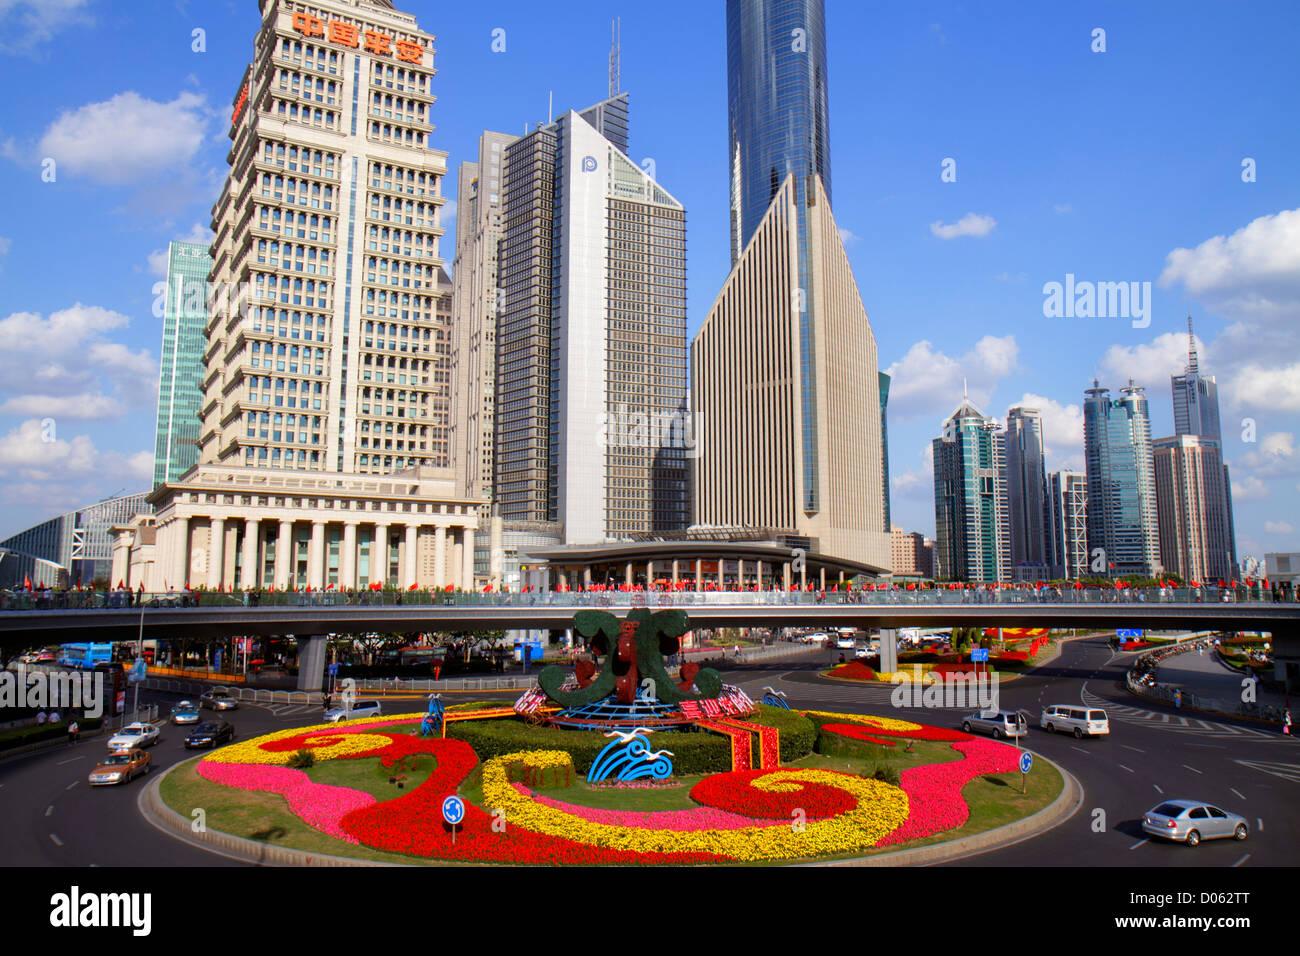 Shanghai China Pudong Lujiazui Financial District Lujiazui Fußgängerbrücke Blick vom Kreisverkehr Stockbild